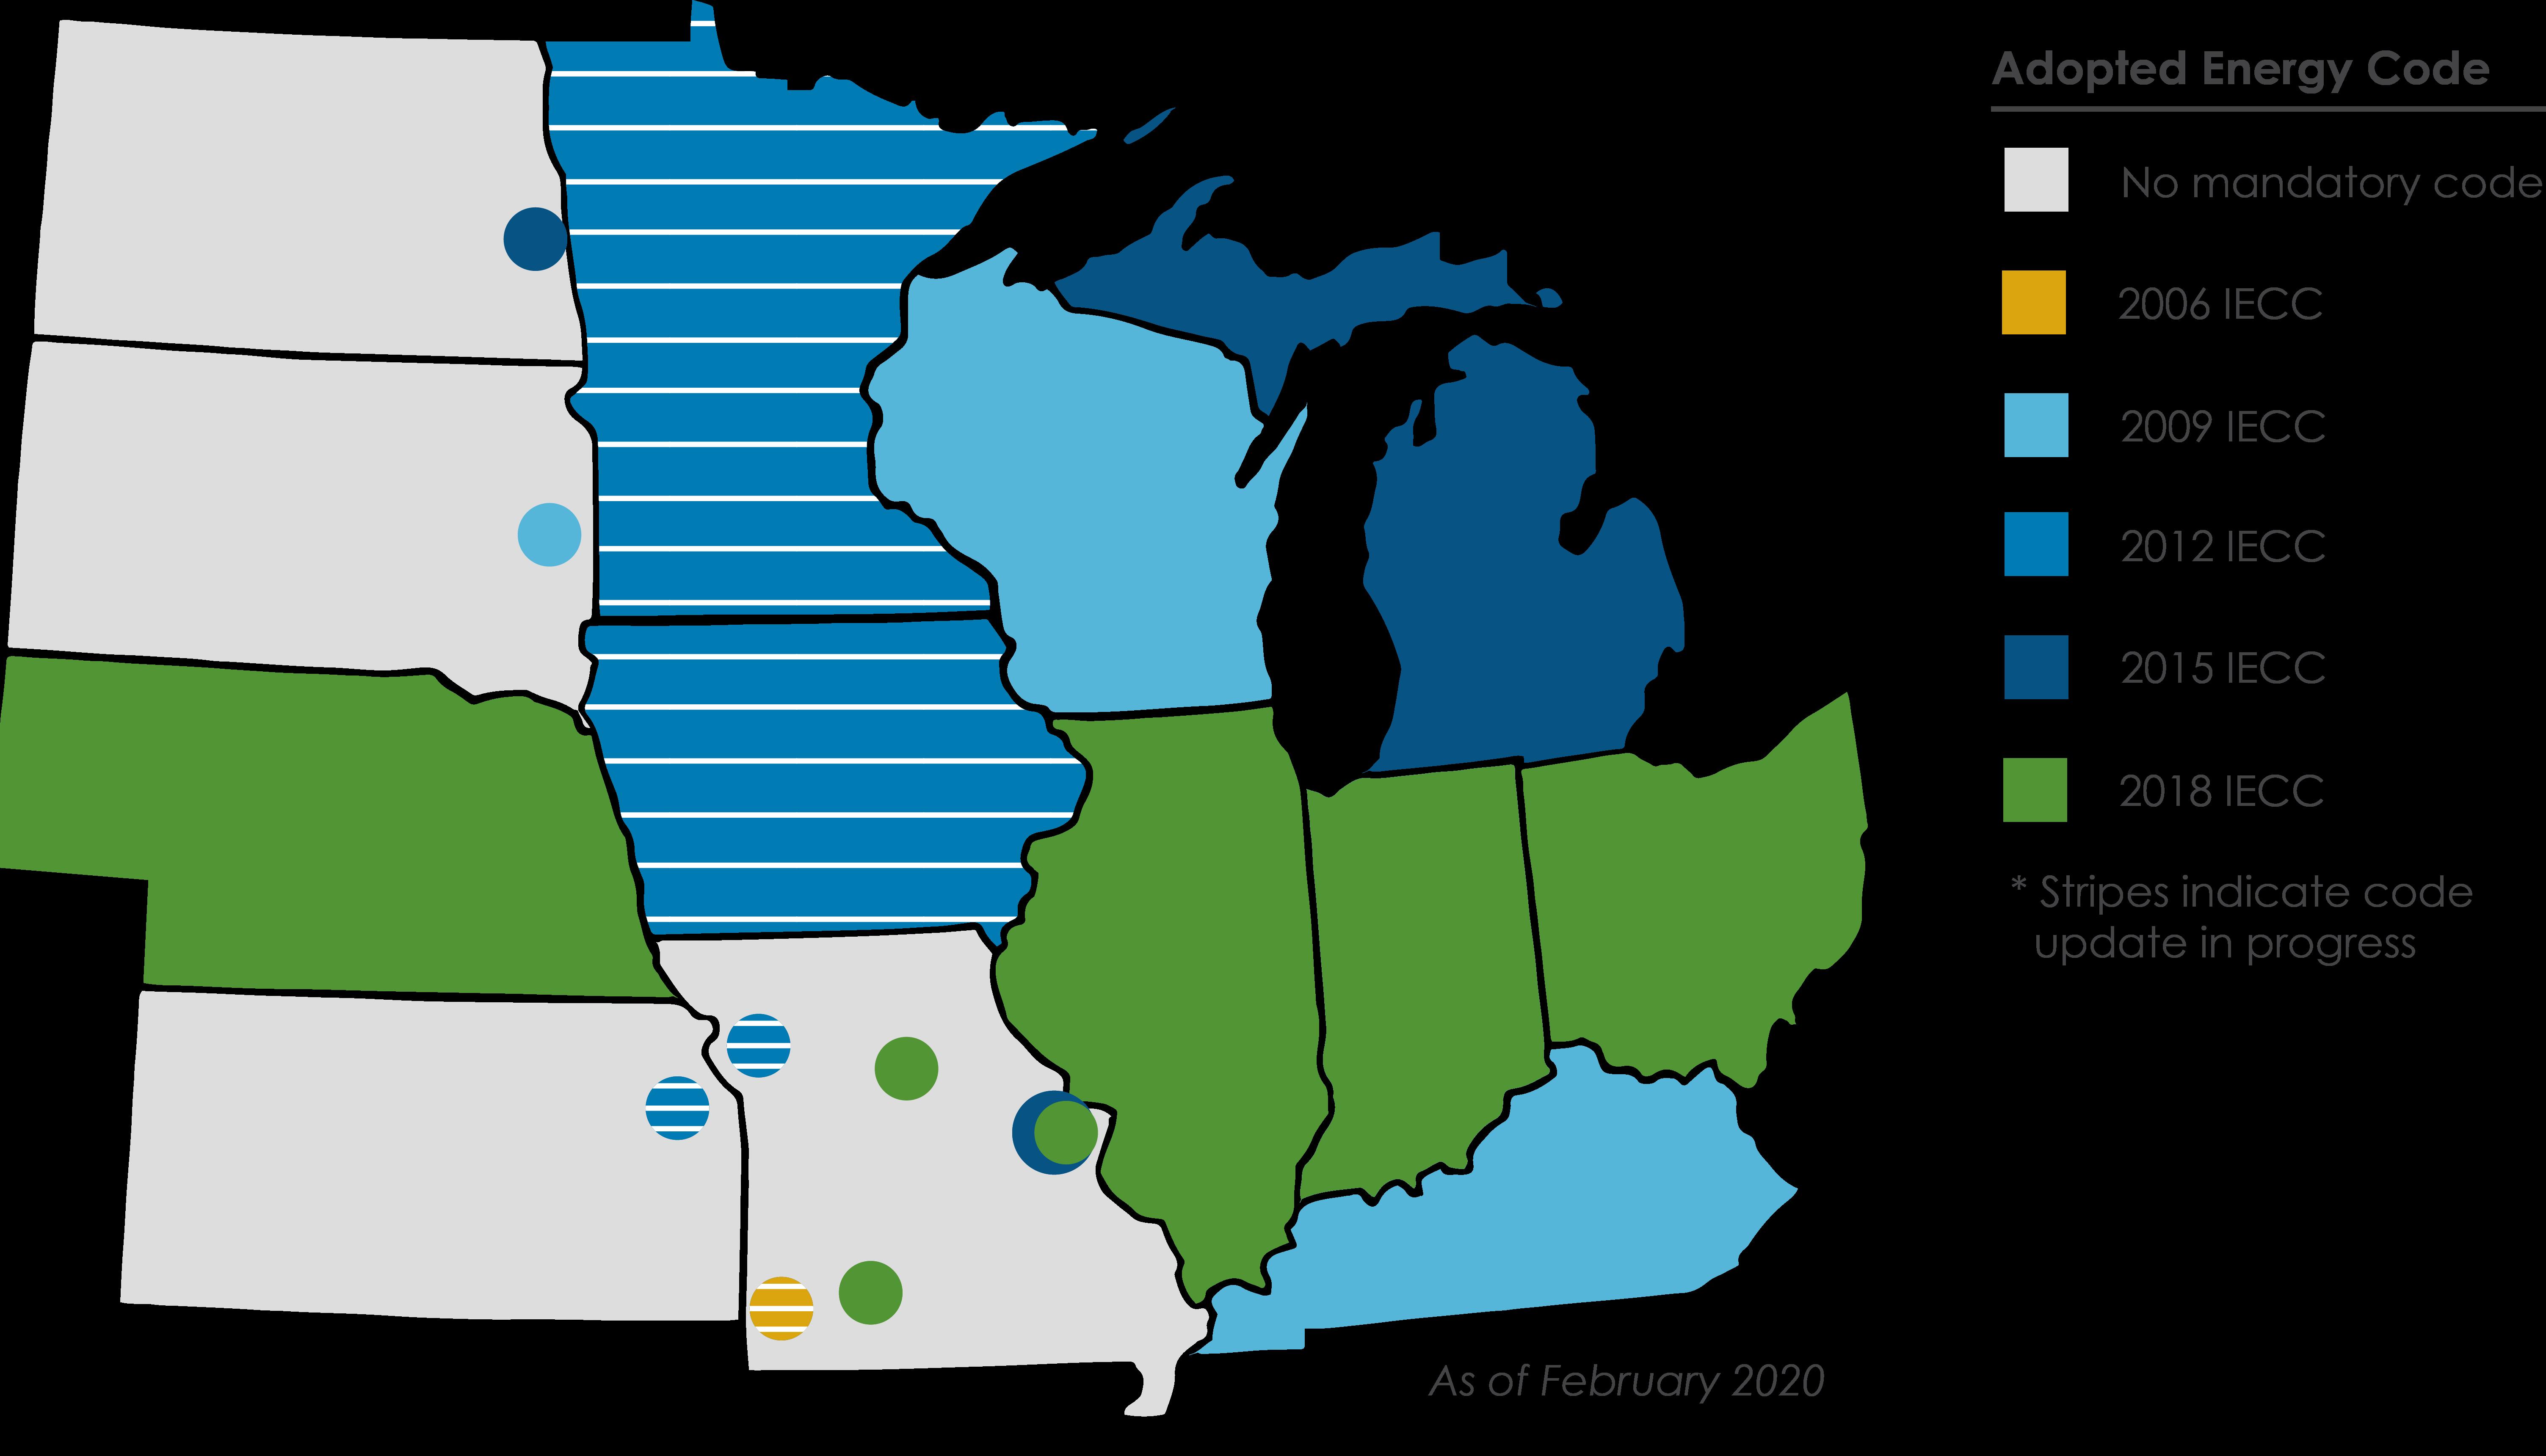 map denoting residential building energy code adoption